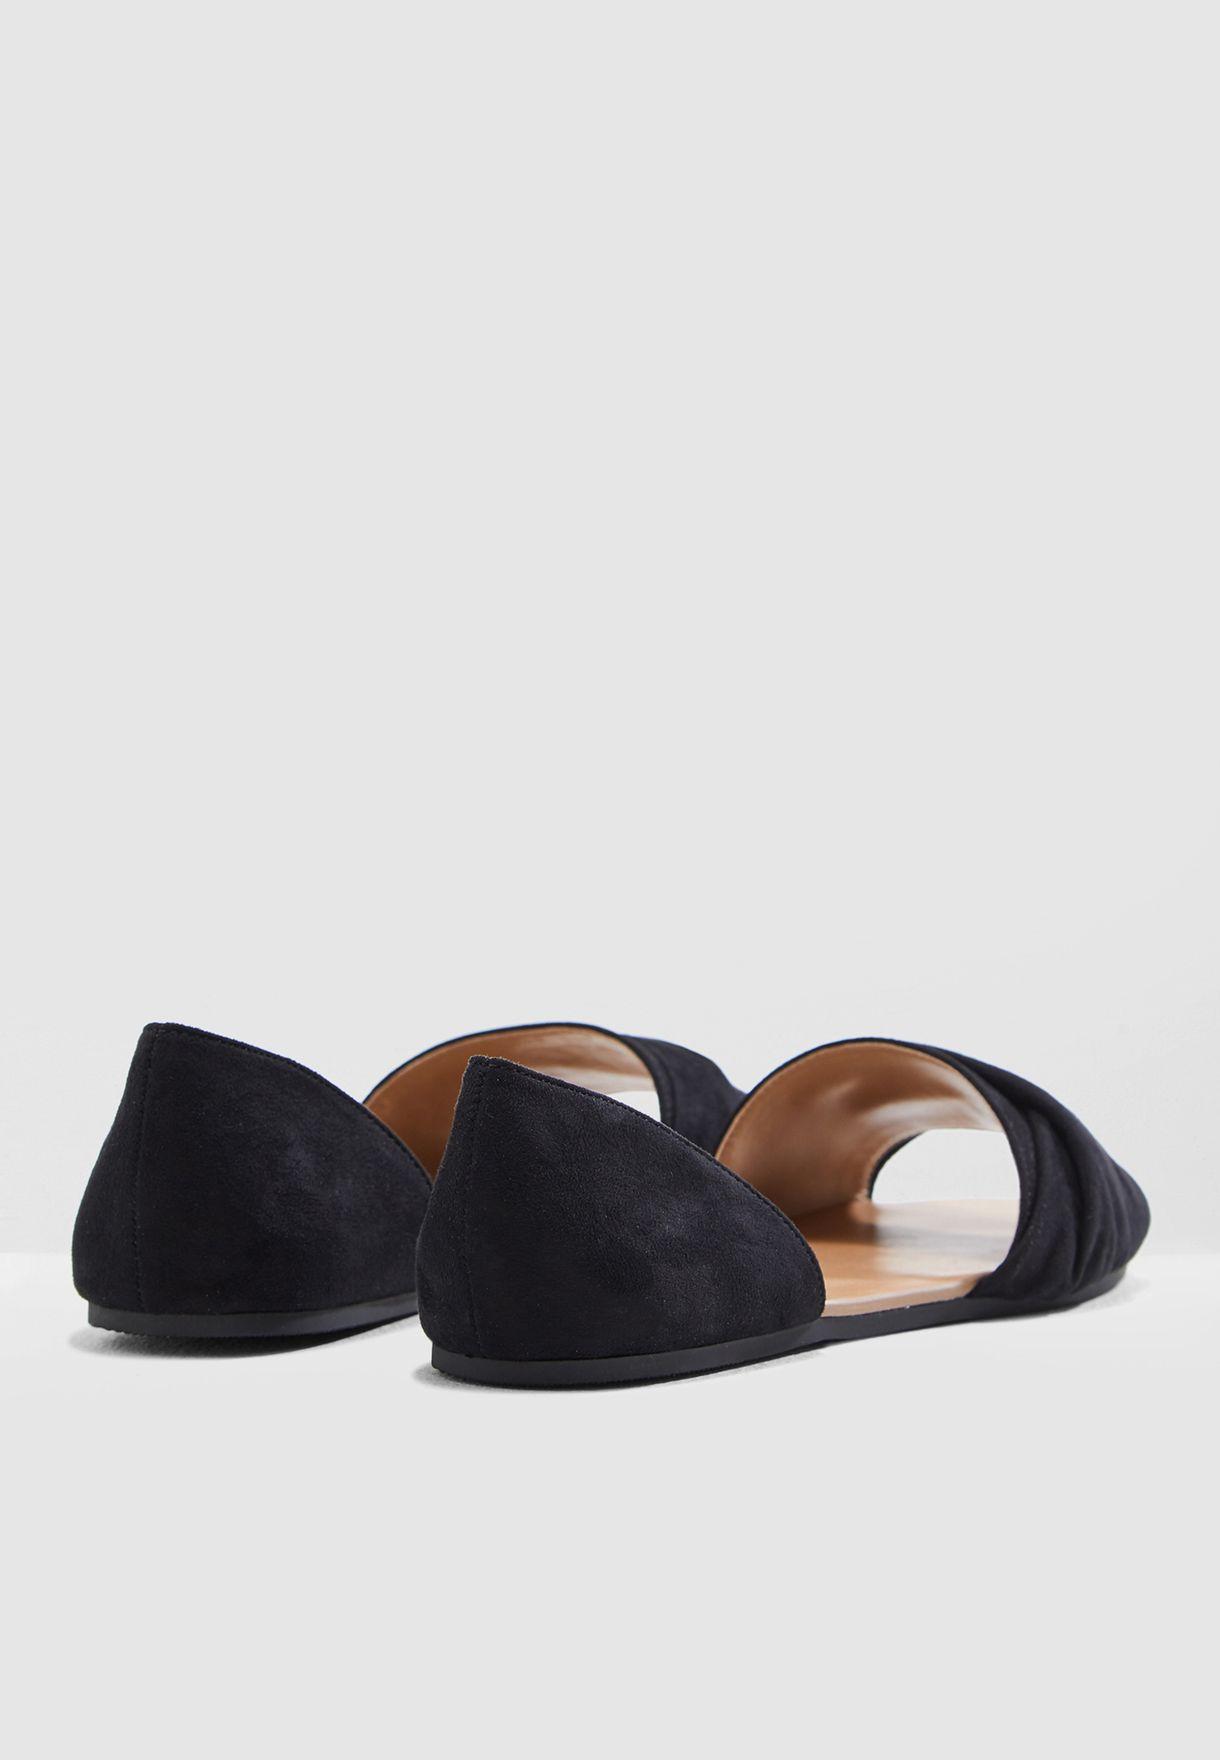 Grang Sandal